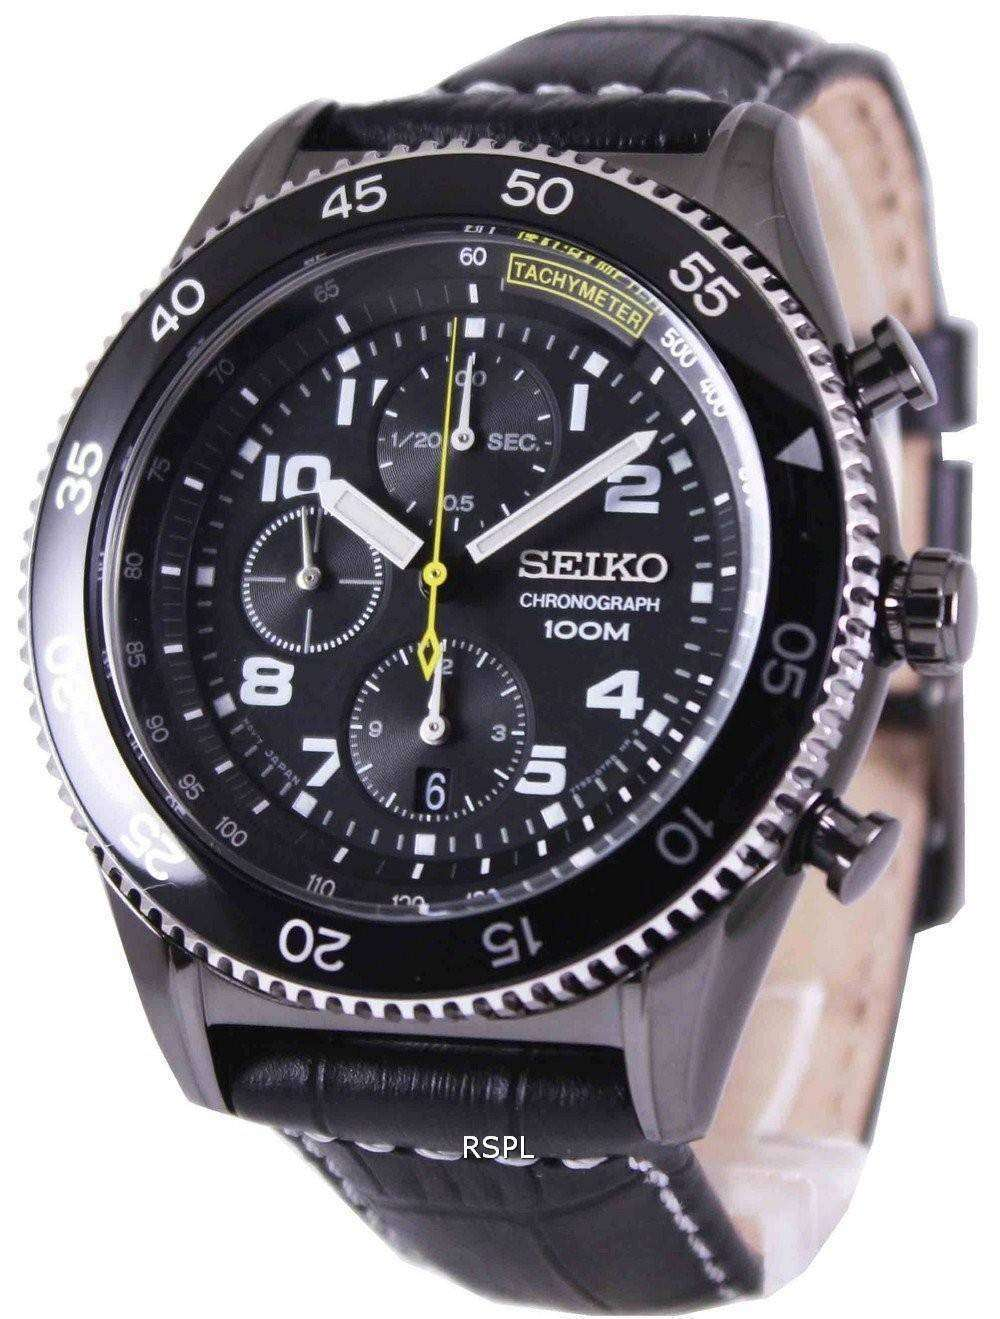 Seiko Chronograph Tachymeter 100M SNDG61P1 SNDG61P Mens Watch ... 695ea1a411ce